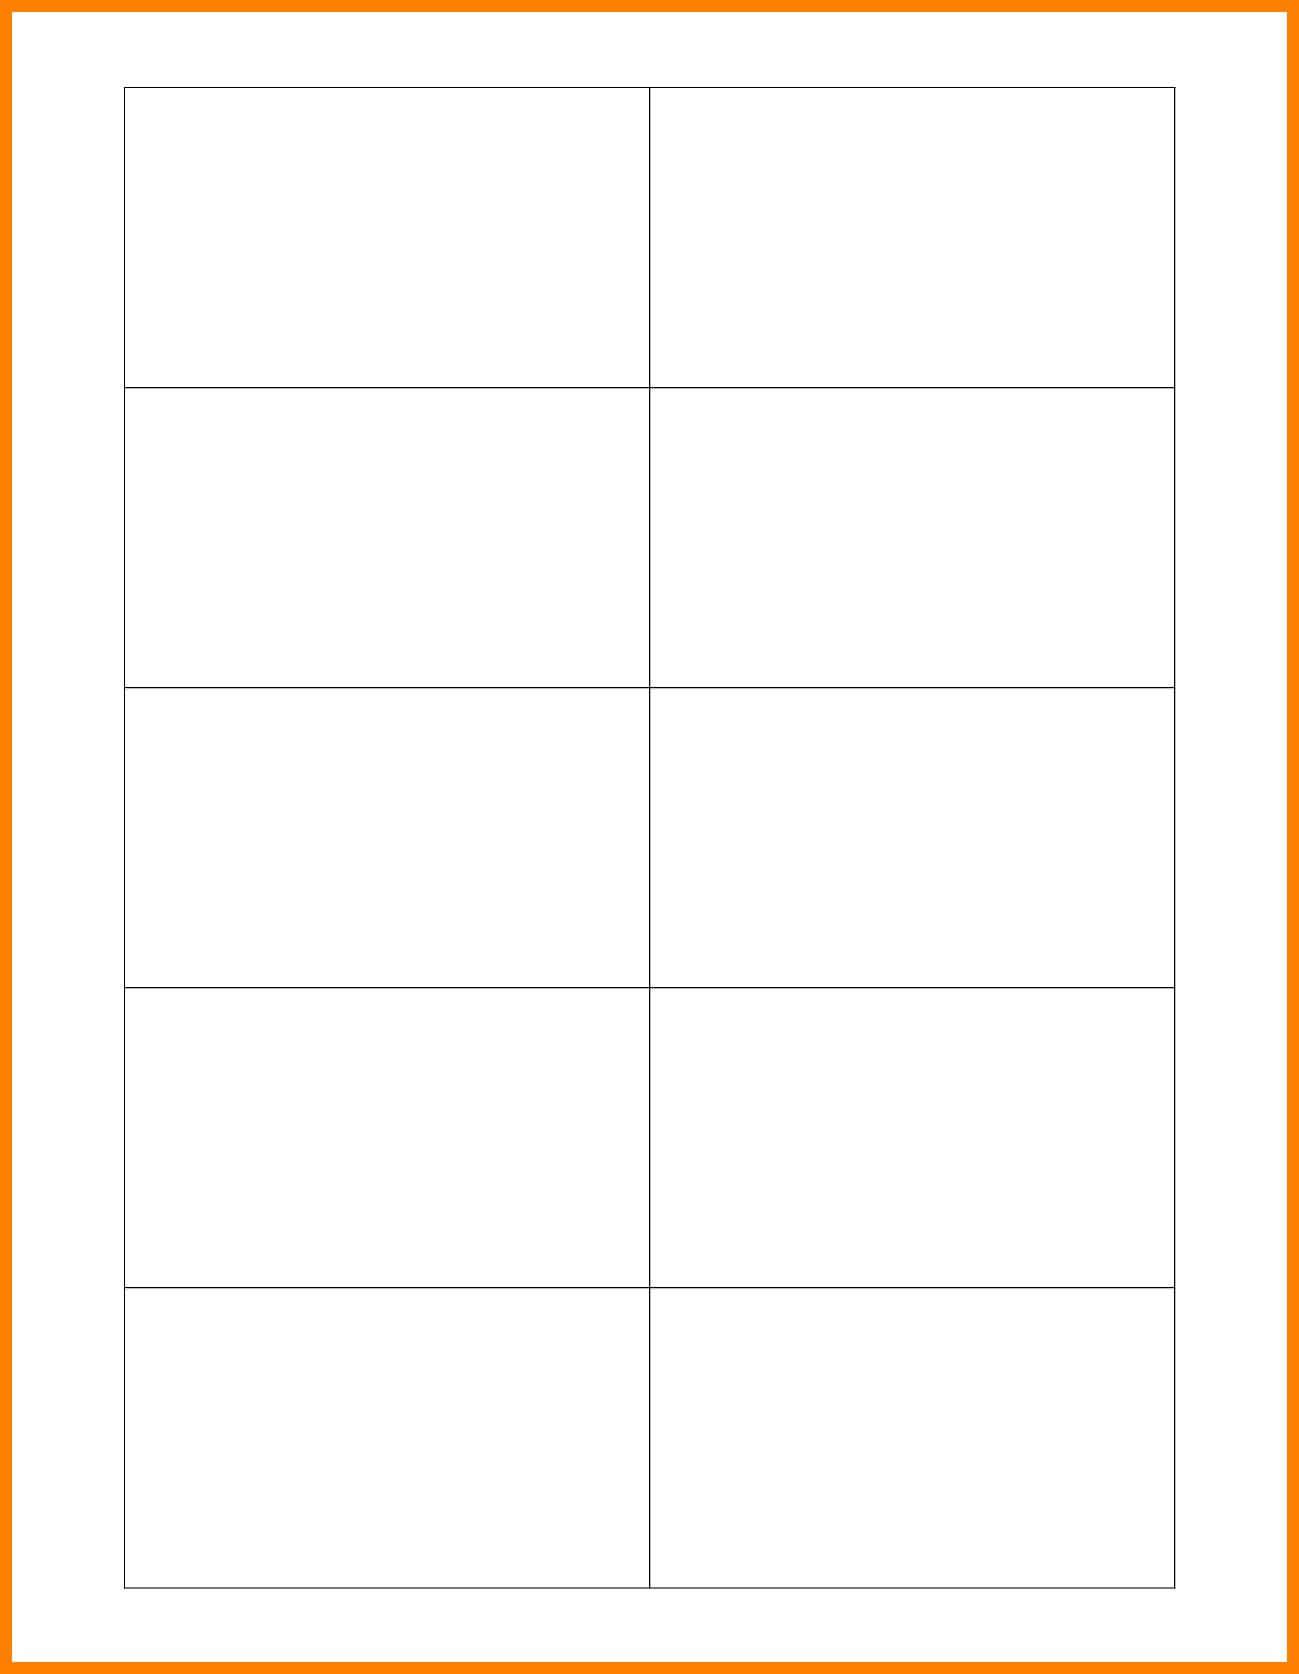 001 Microsoft Word Blank Business Card Template Free For Word 2013 Business Card Template